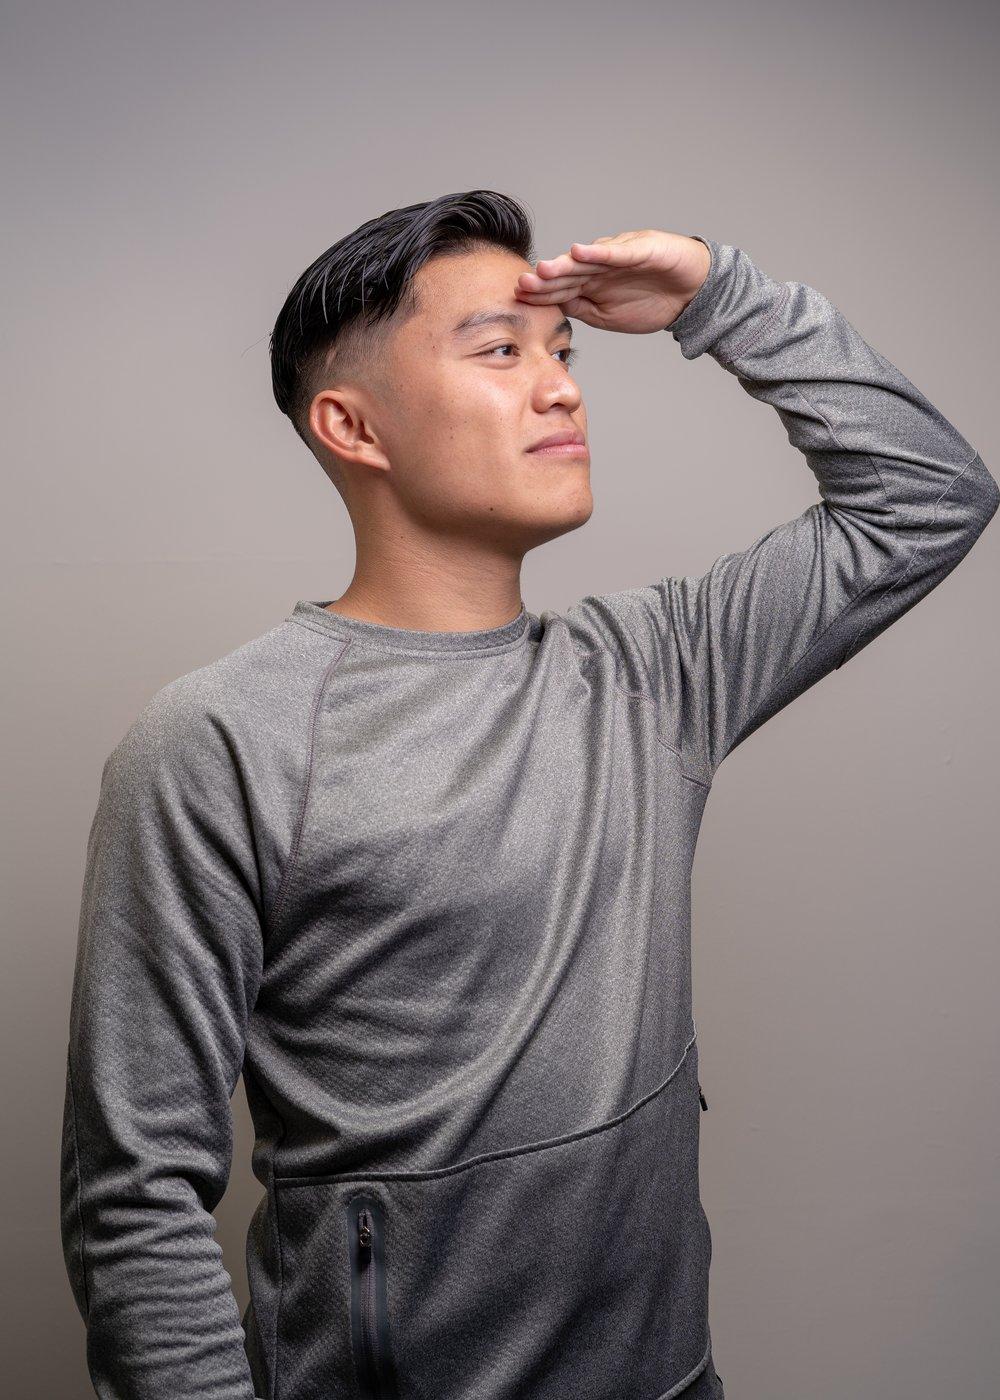 Chris - SEO & Analytics